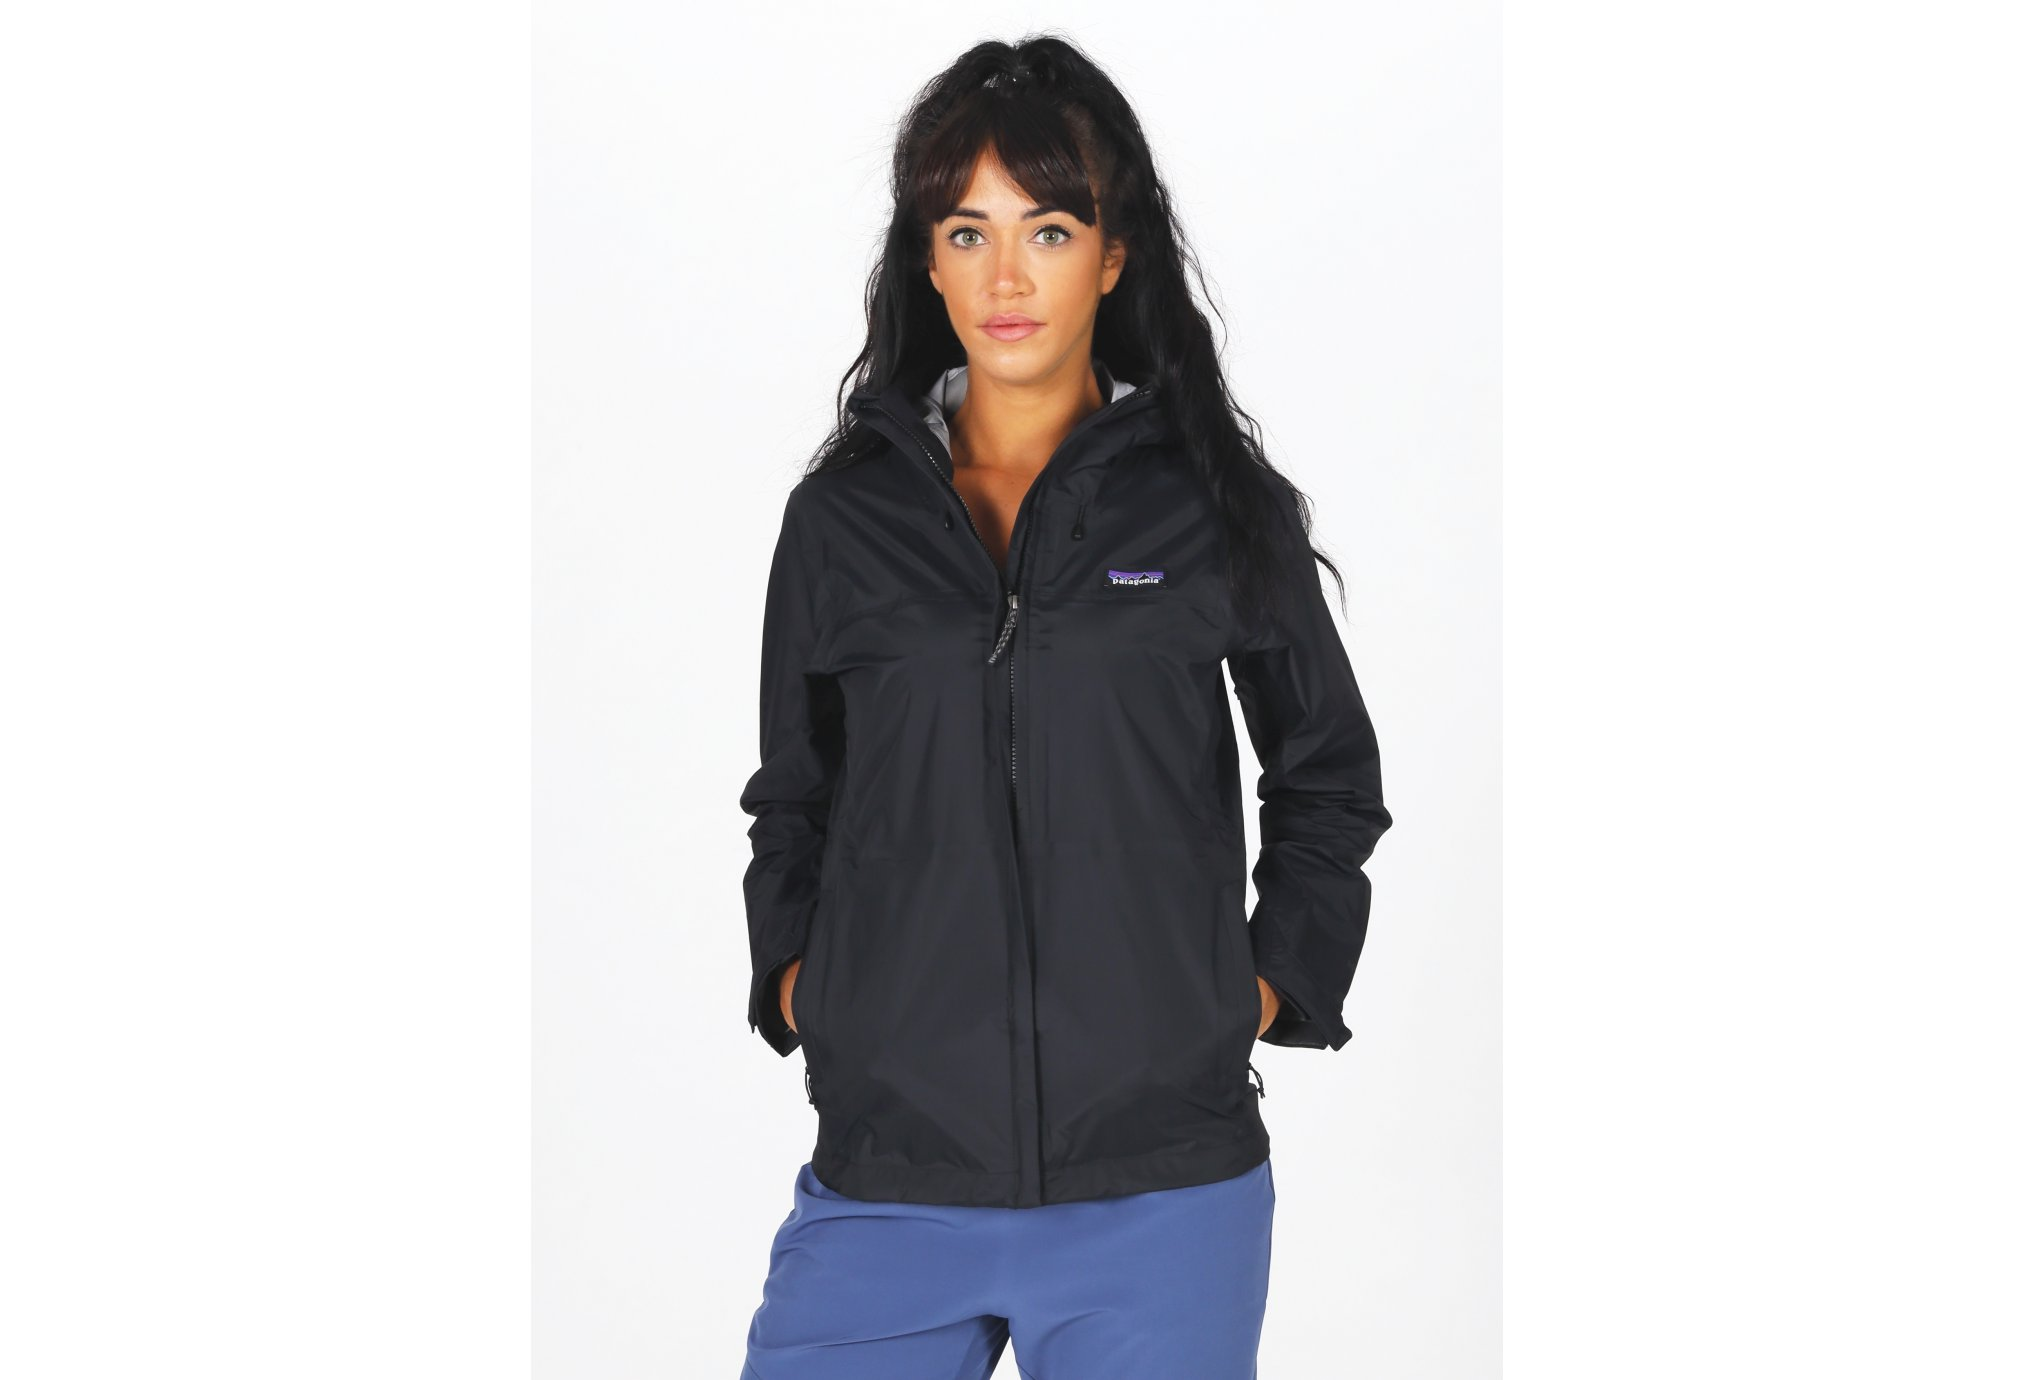 Patagonia Torrentshell 3L W vêtement running femme